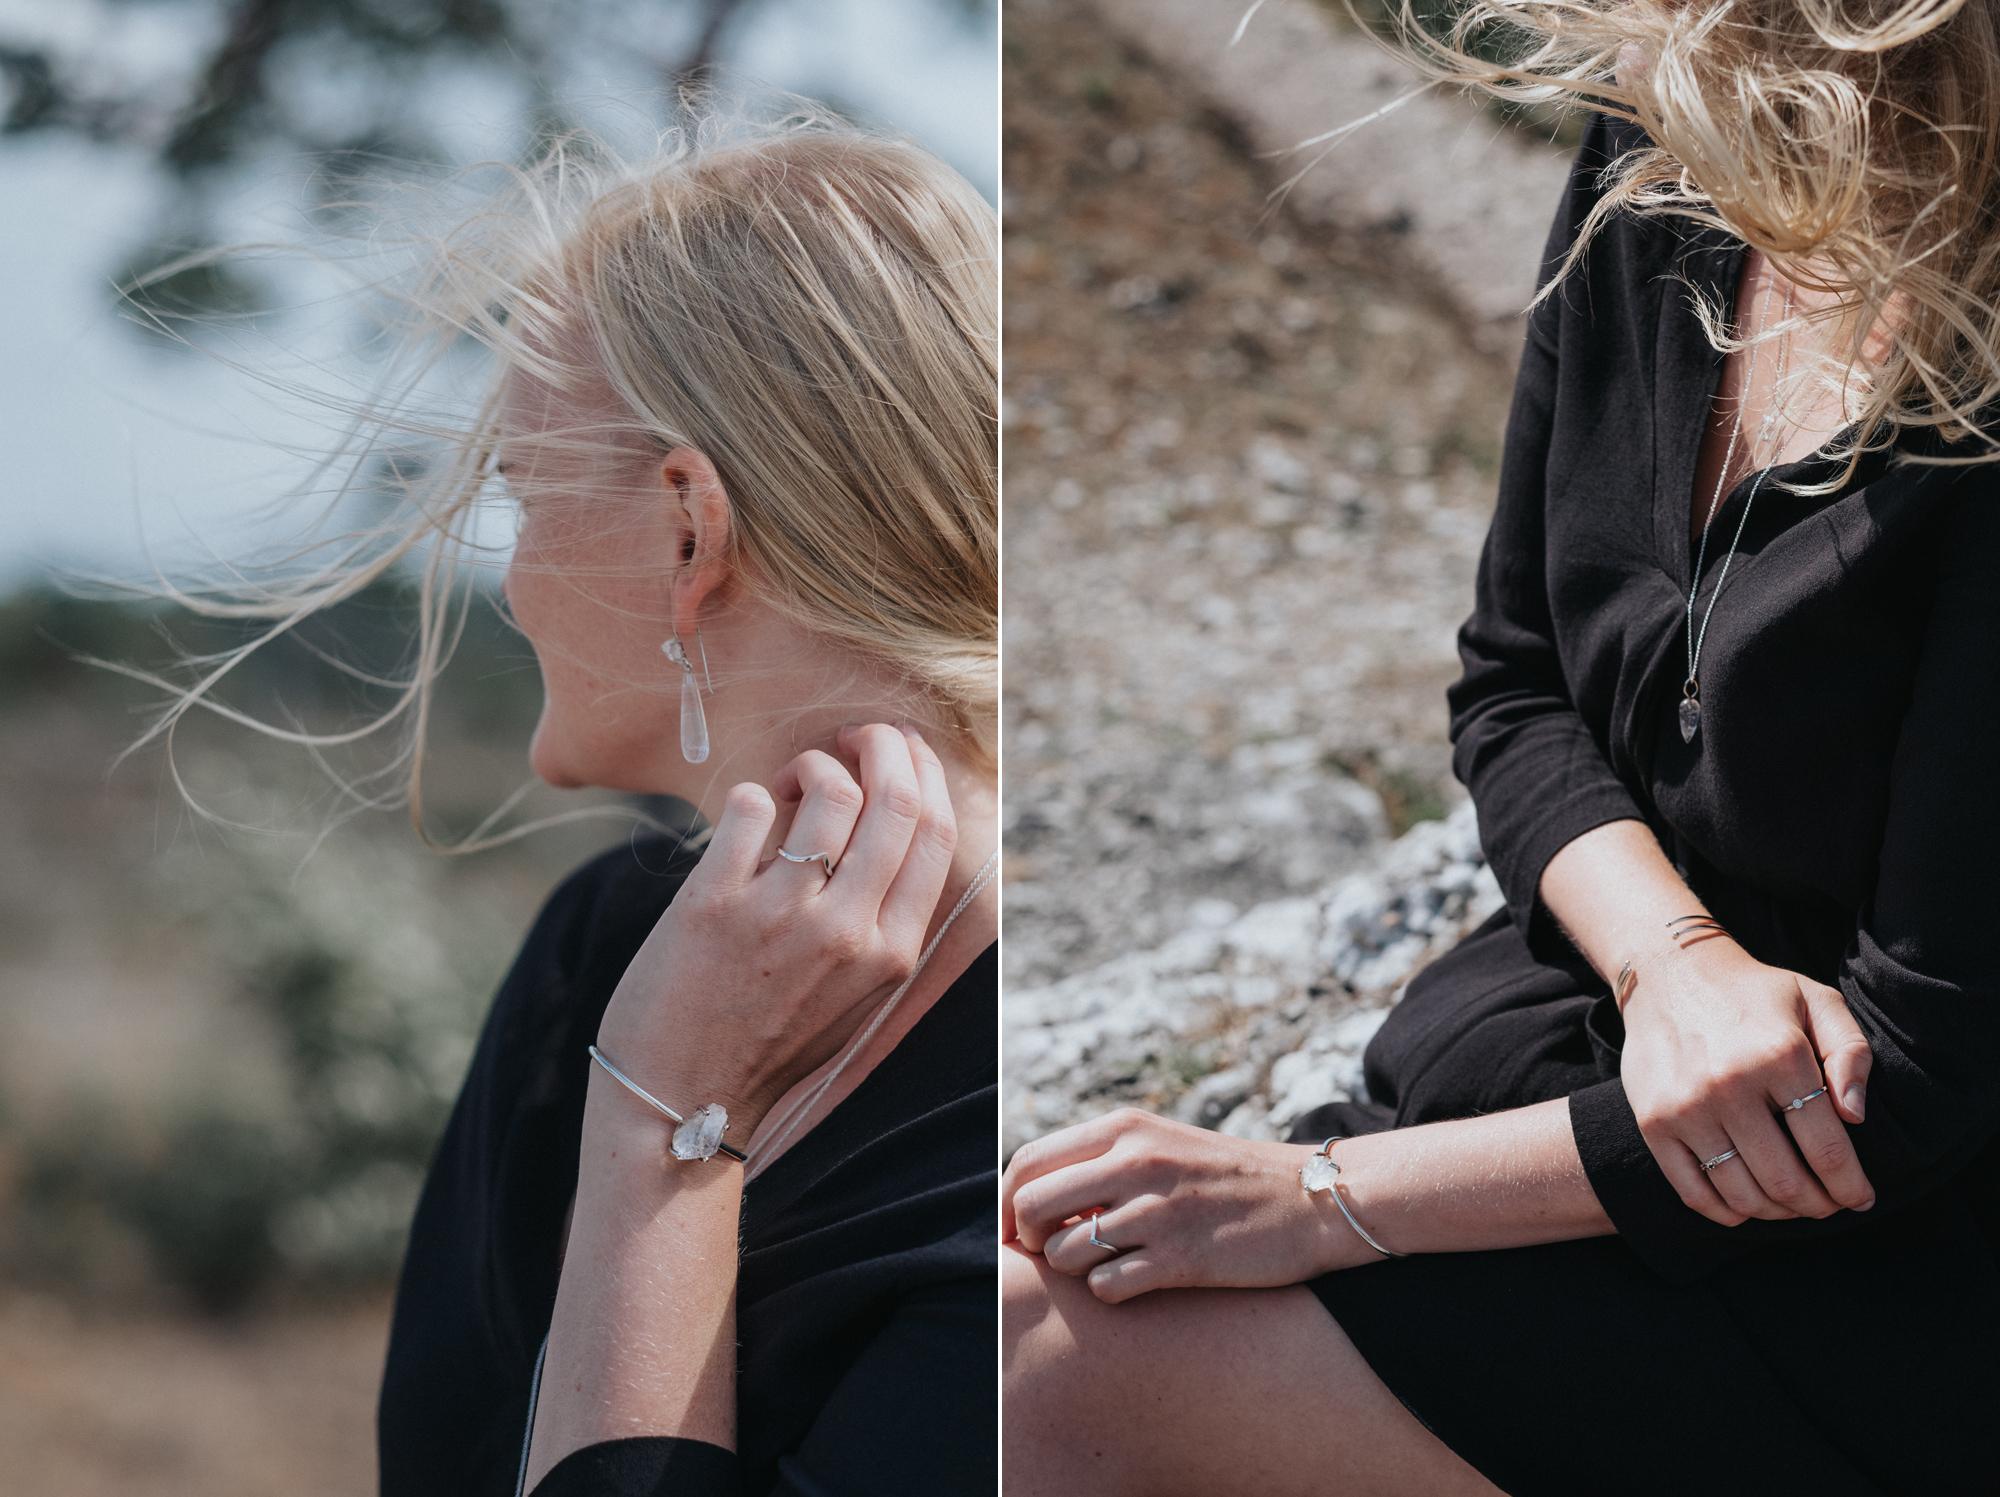 009-företagsfoto-gotland-malin-ivarsson-jewelry-neas-fotografi.jpg